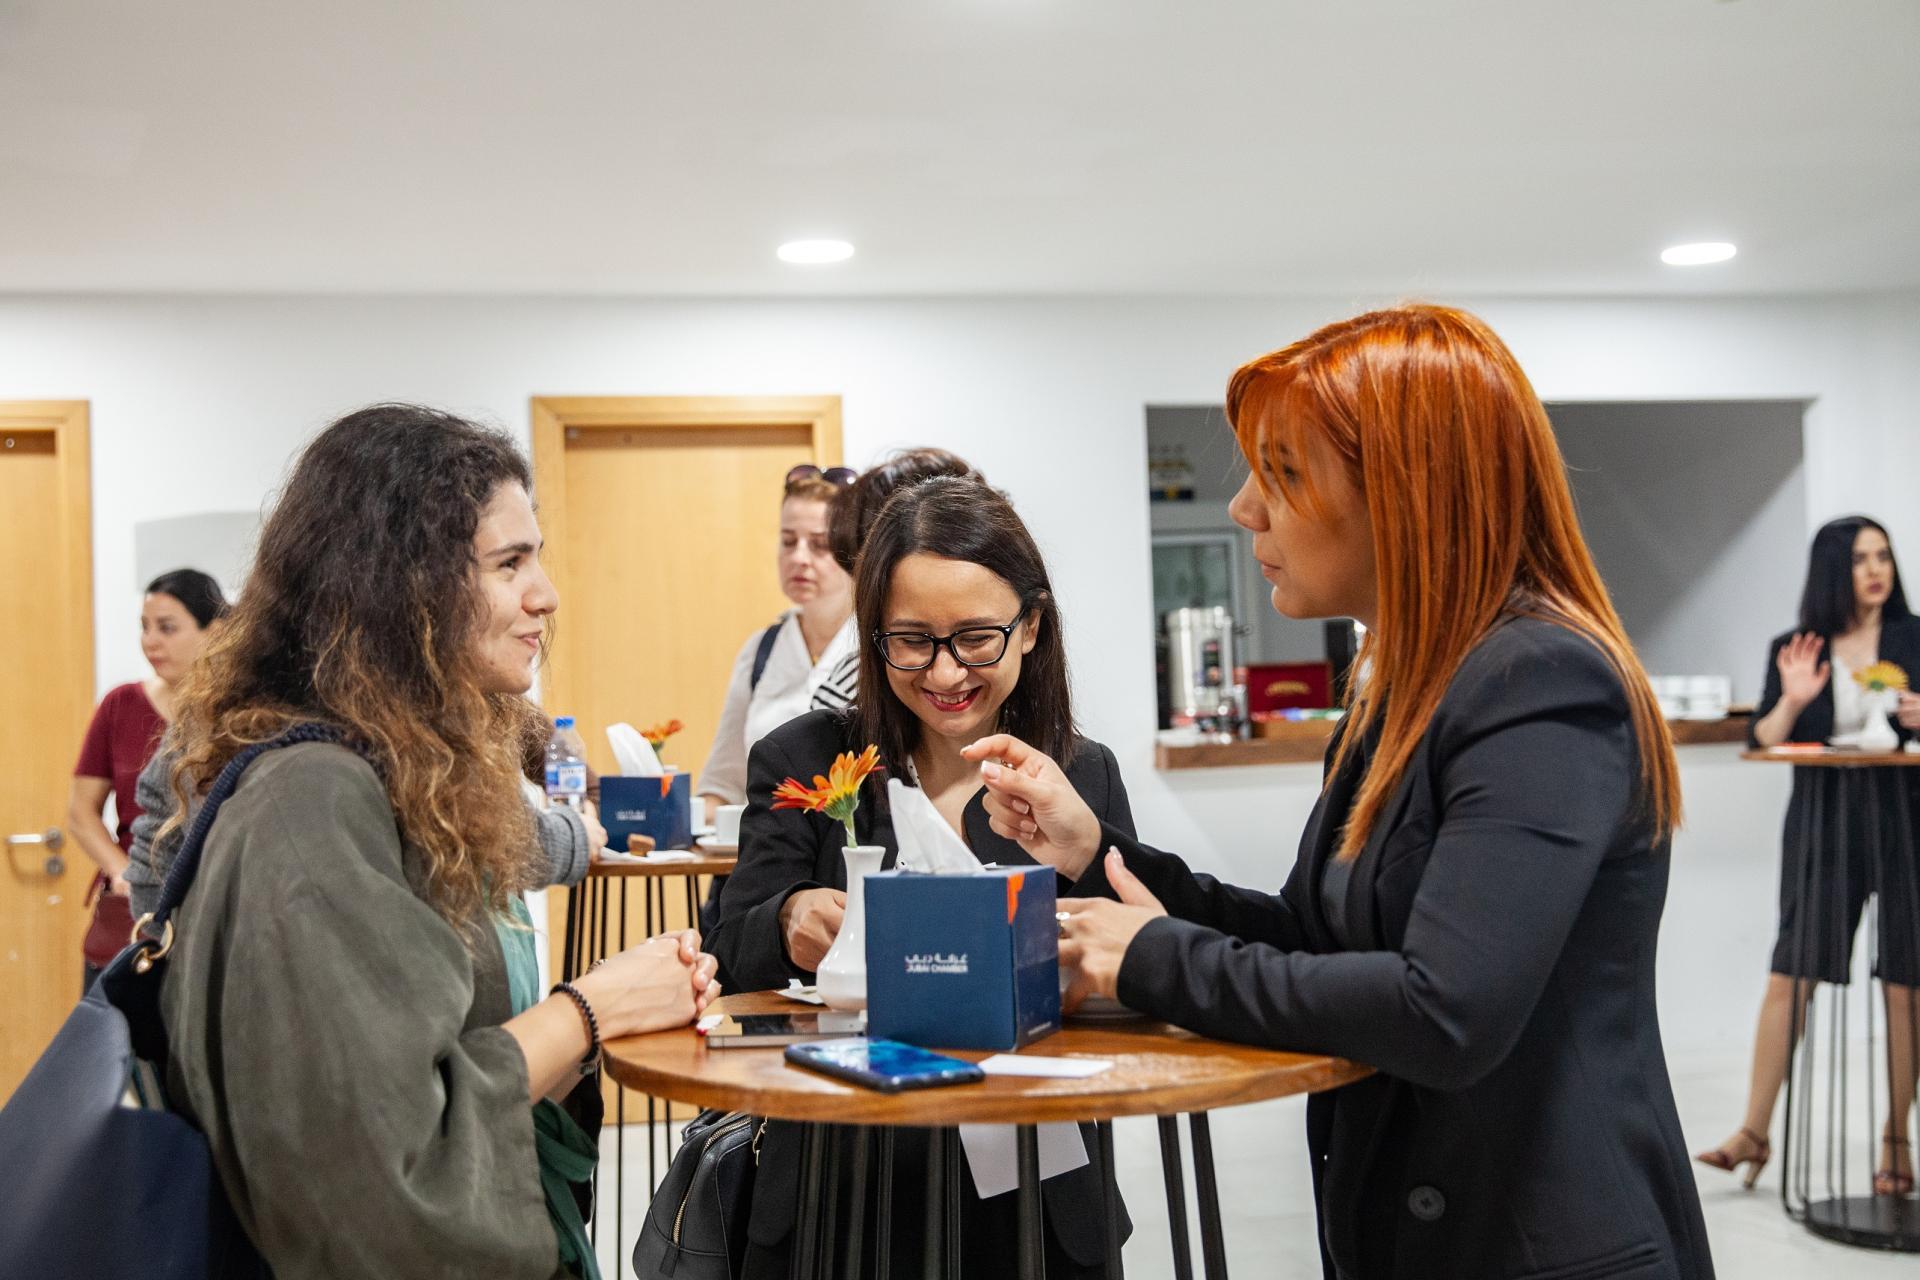 Azerbaijan, France Dubai Chambers held business skills training for female artisans.